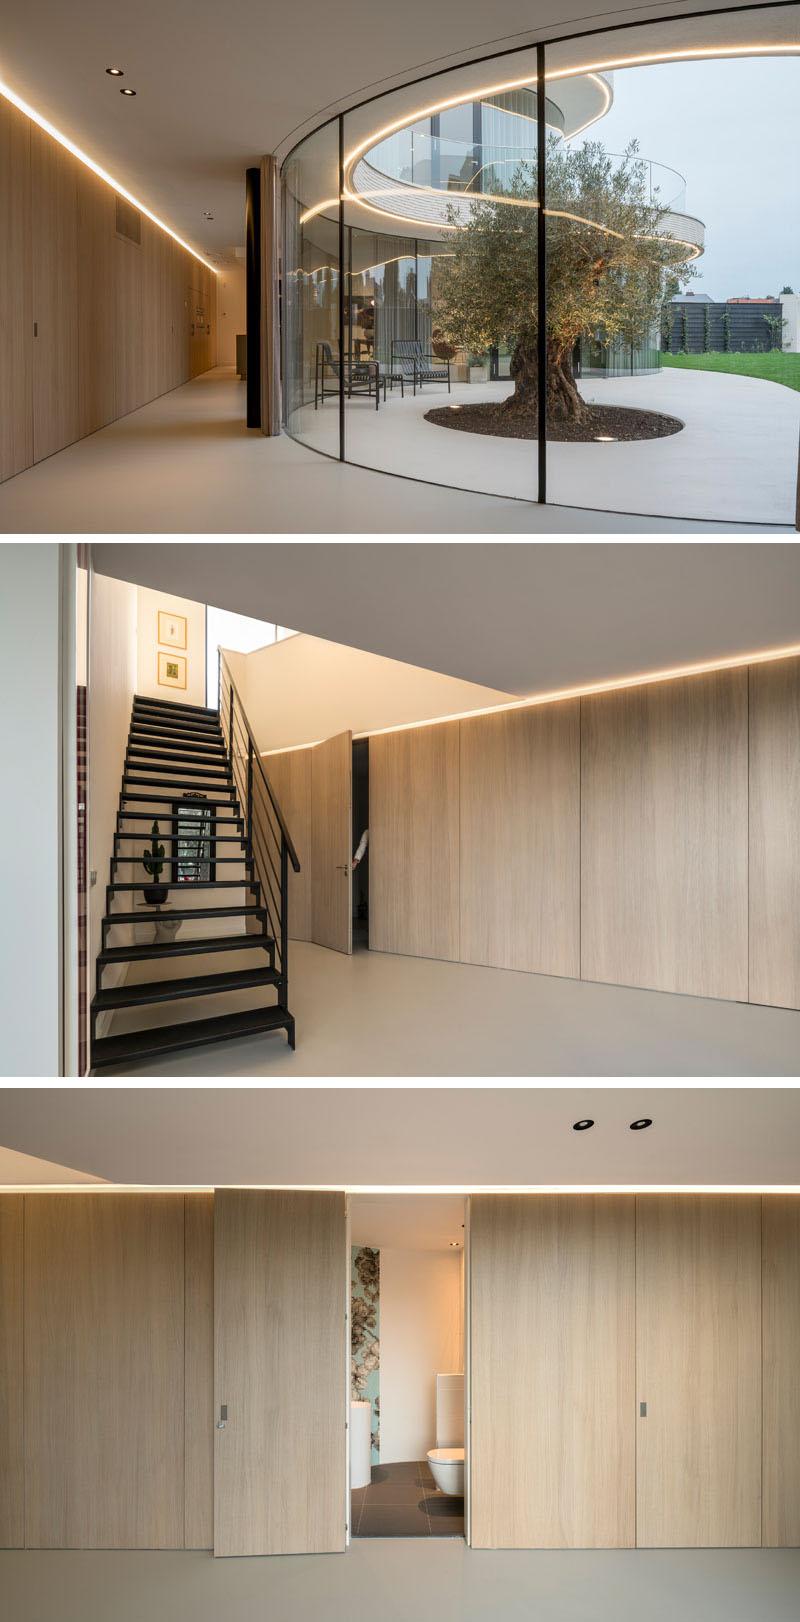 curved-windows-hidden-bathroom-stairs-130317-1008-03